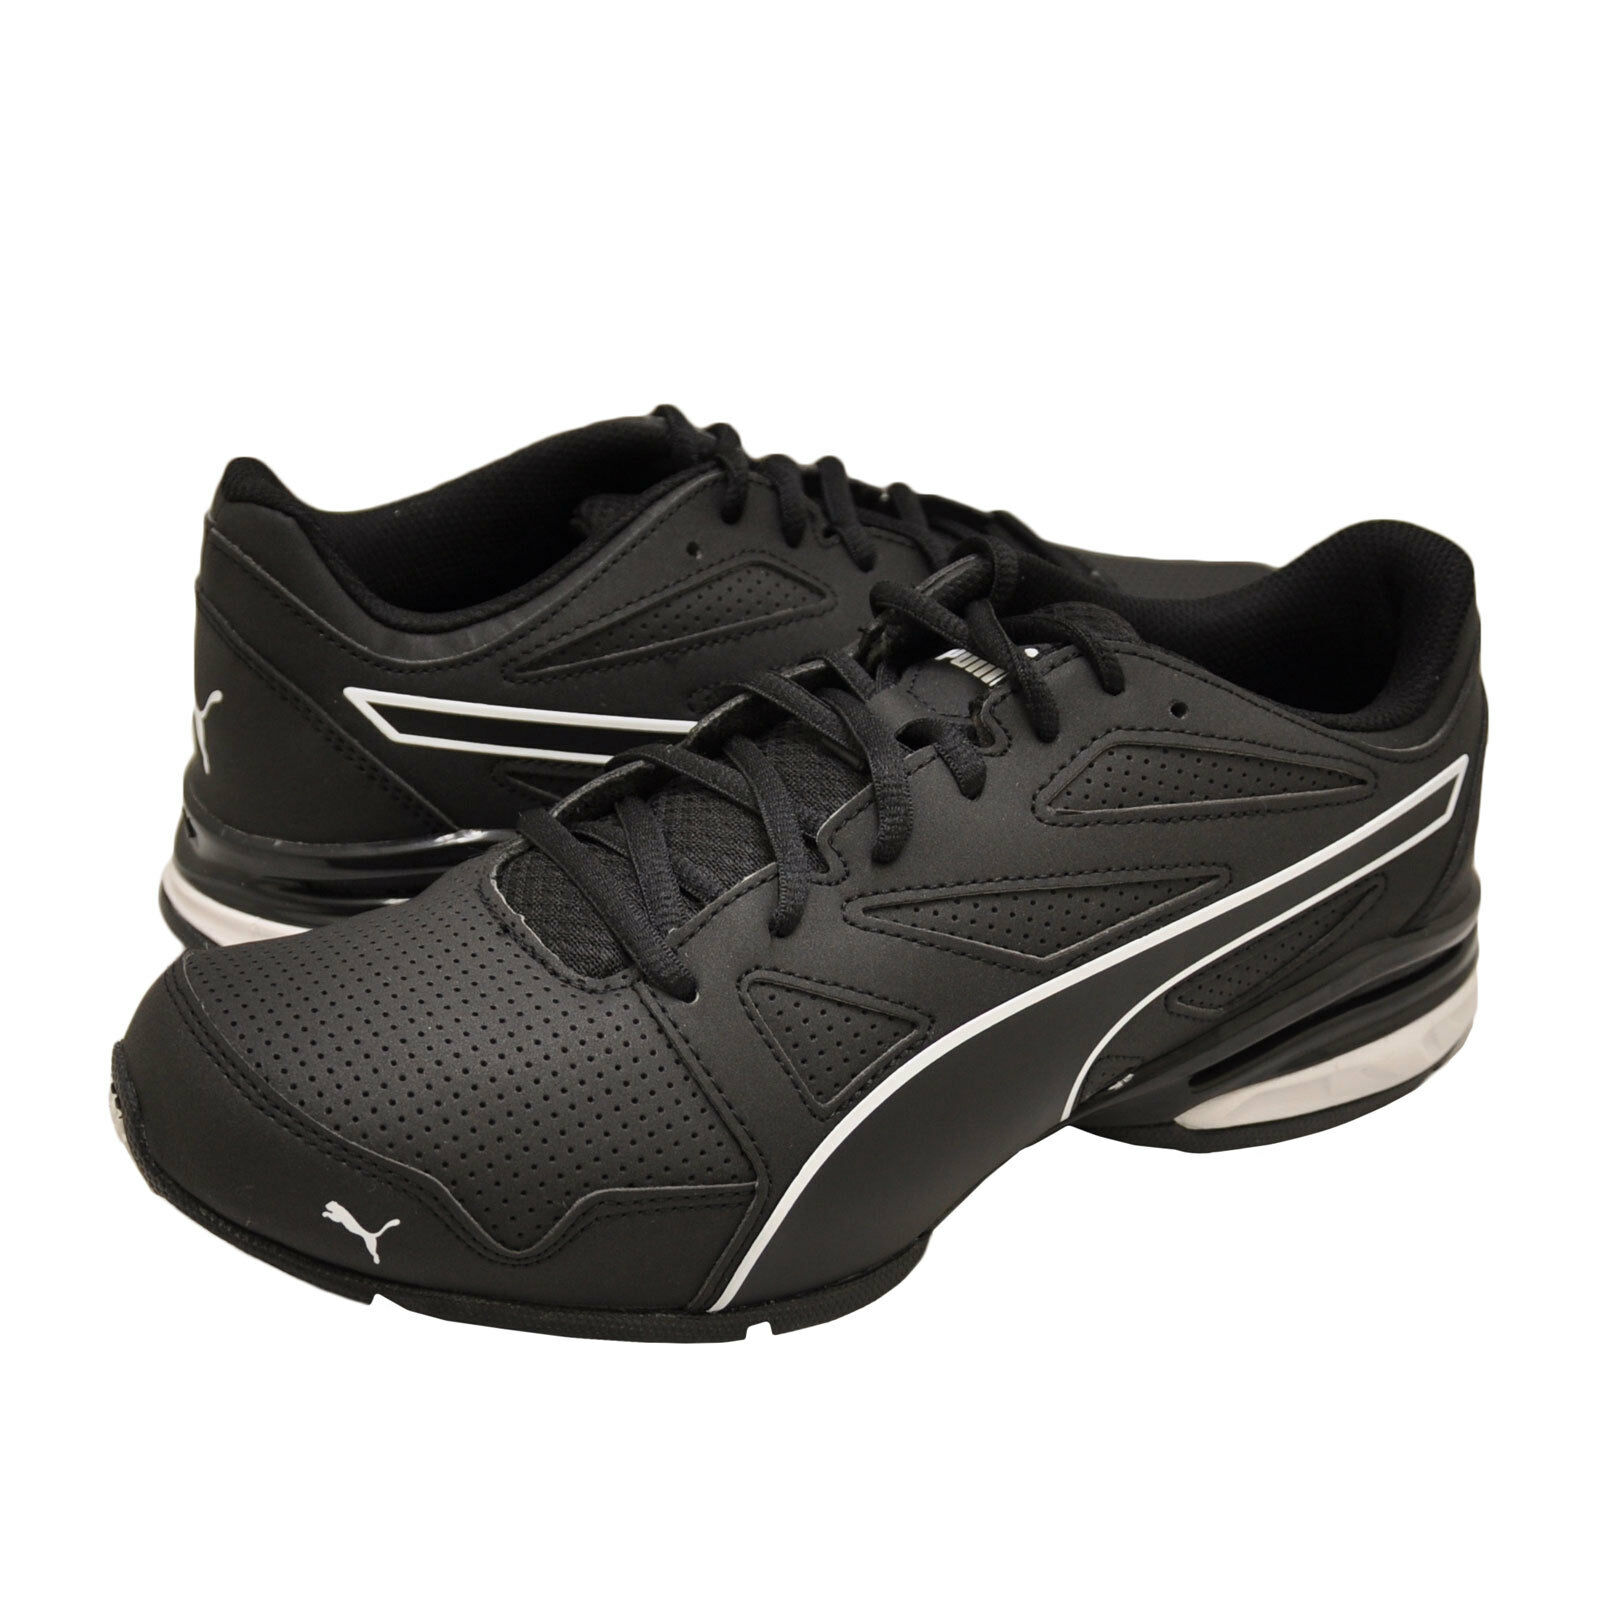 Men's shoes PUMA Tazon Modern SL FM Sneaker 190296-12 Black   White New